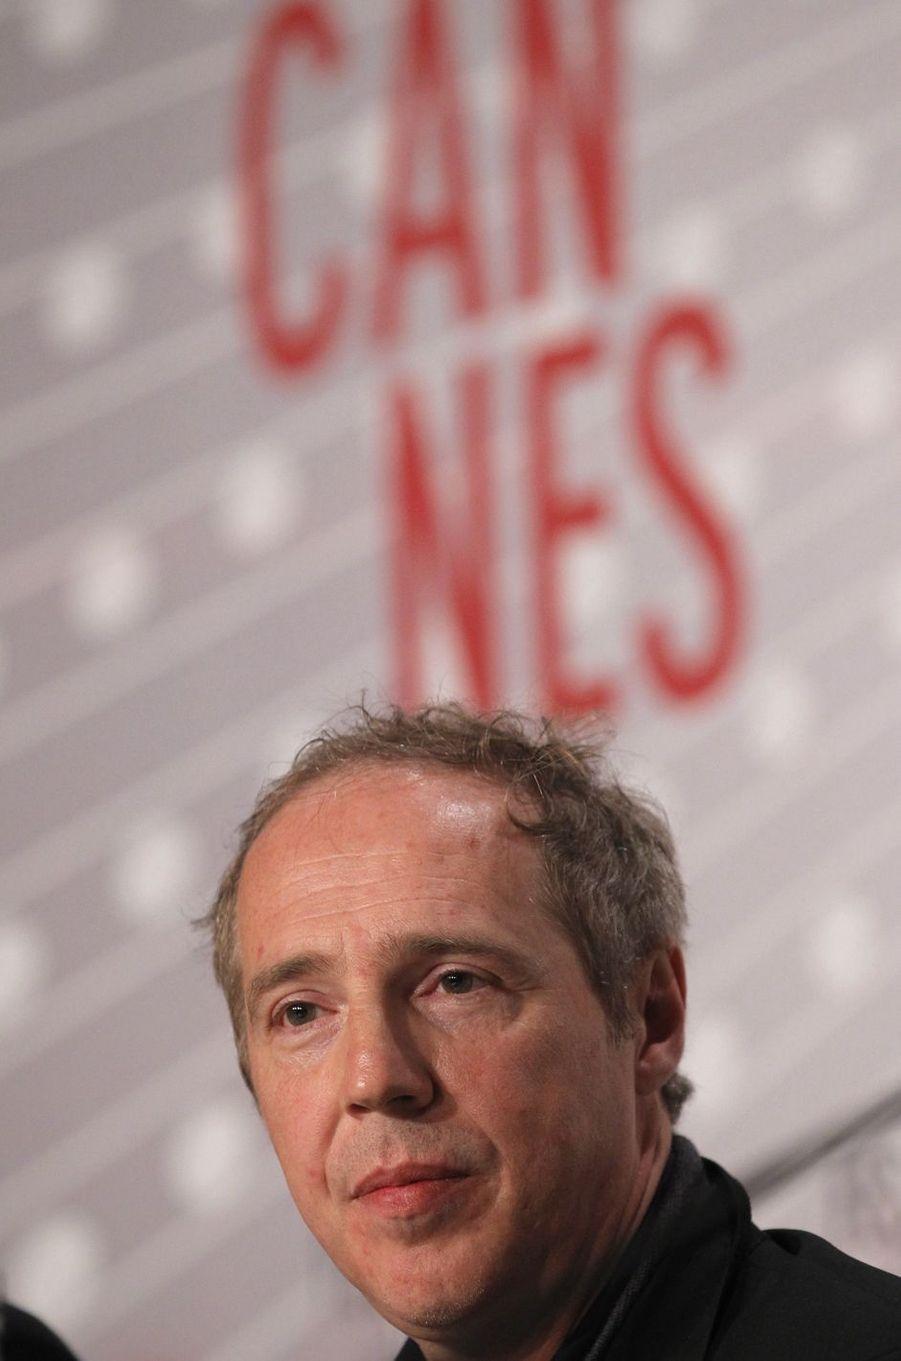 Le réalisateur Arnaud Desplechin (chevalier).